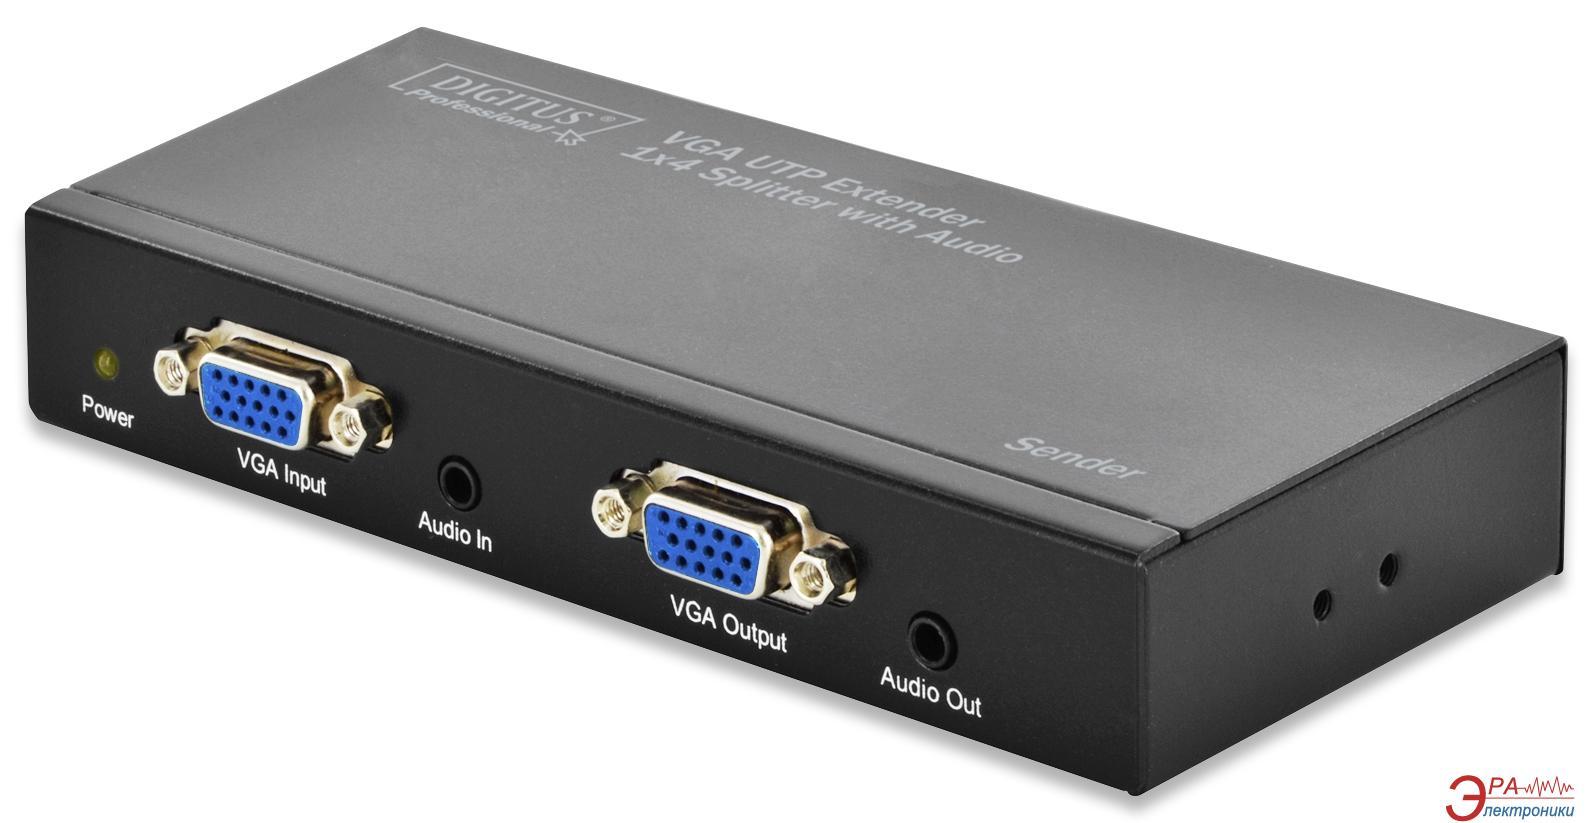 Переходник Digitus 2-port extender over UTP 300m Black (DS-53420)